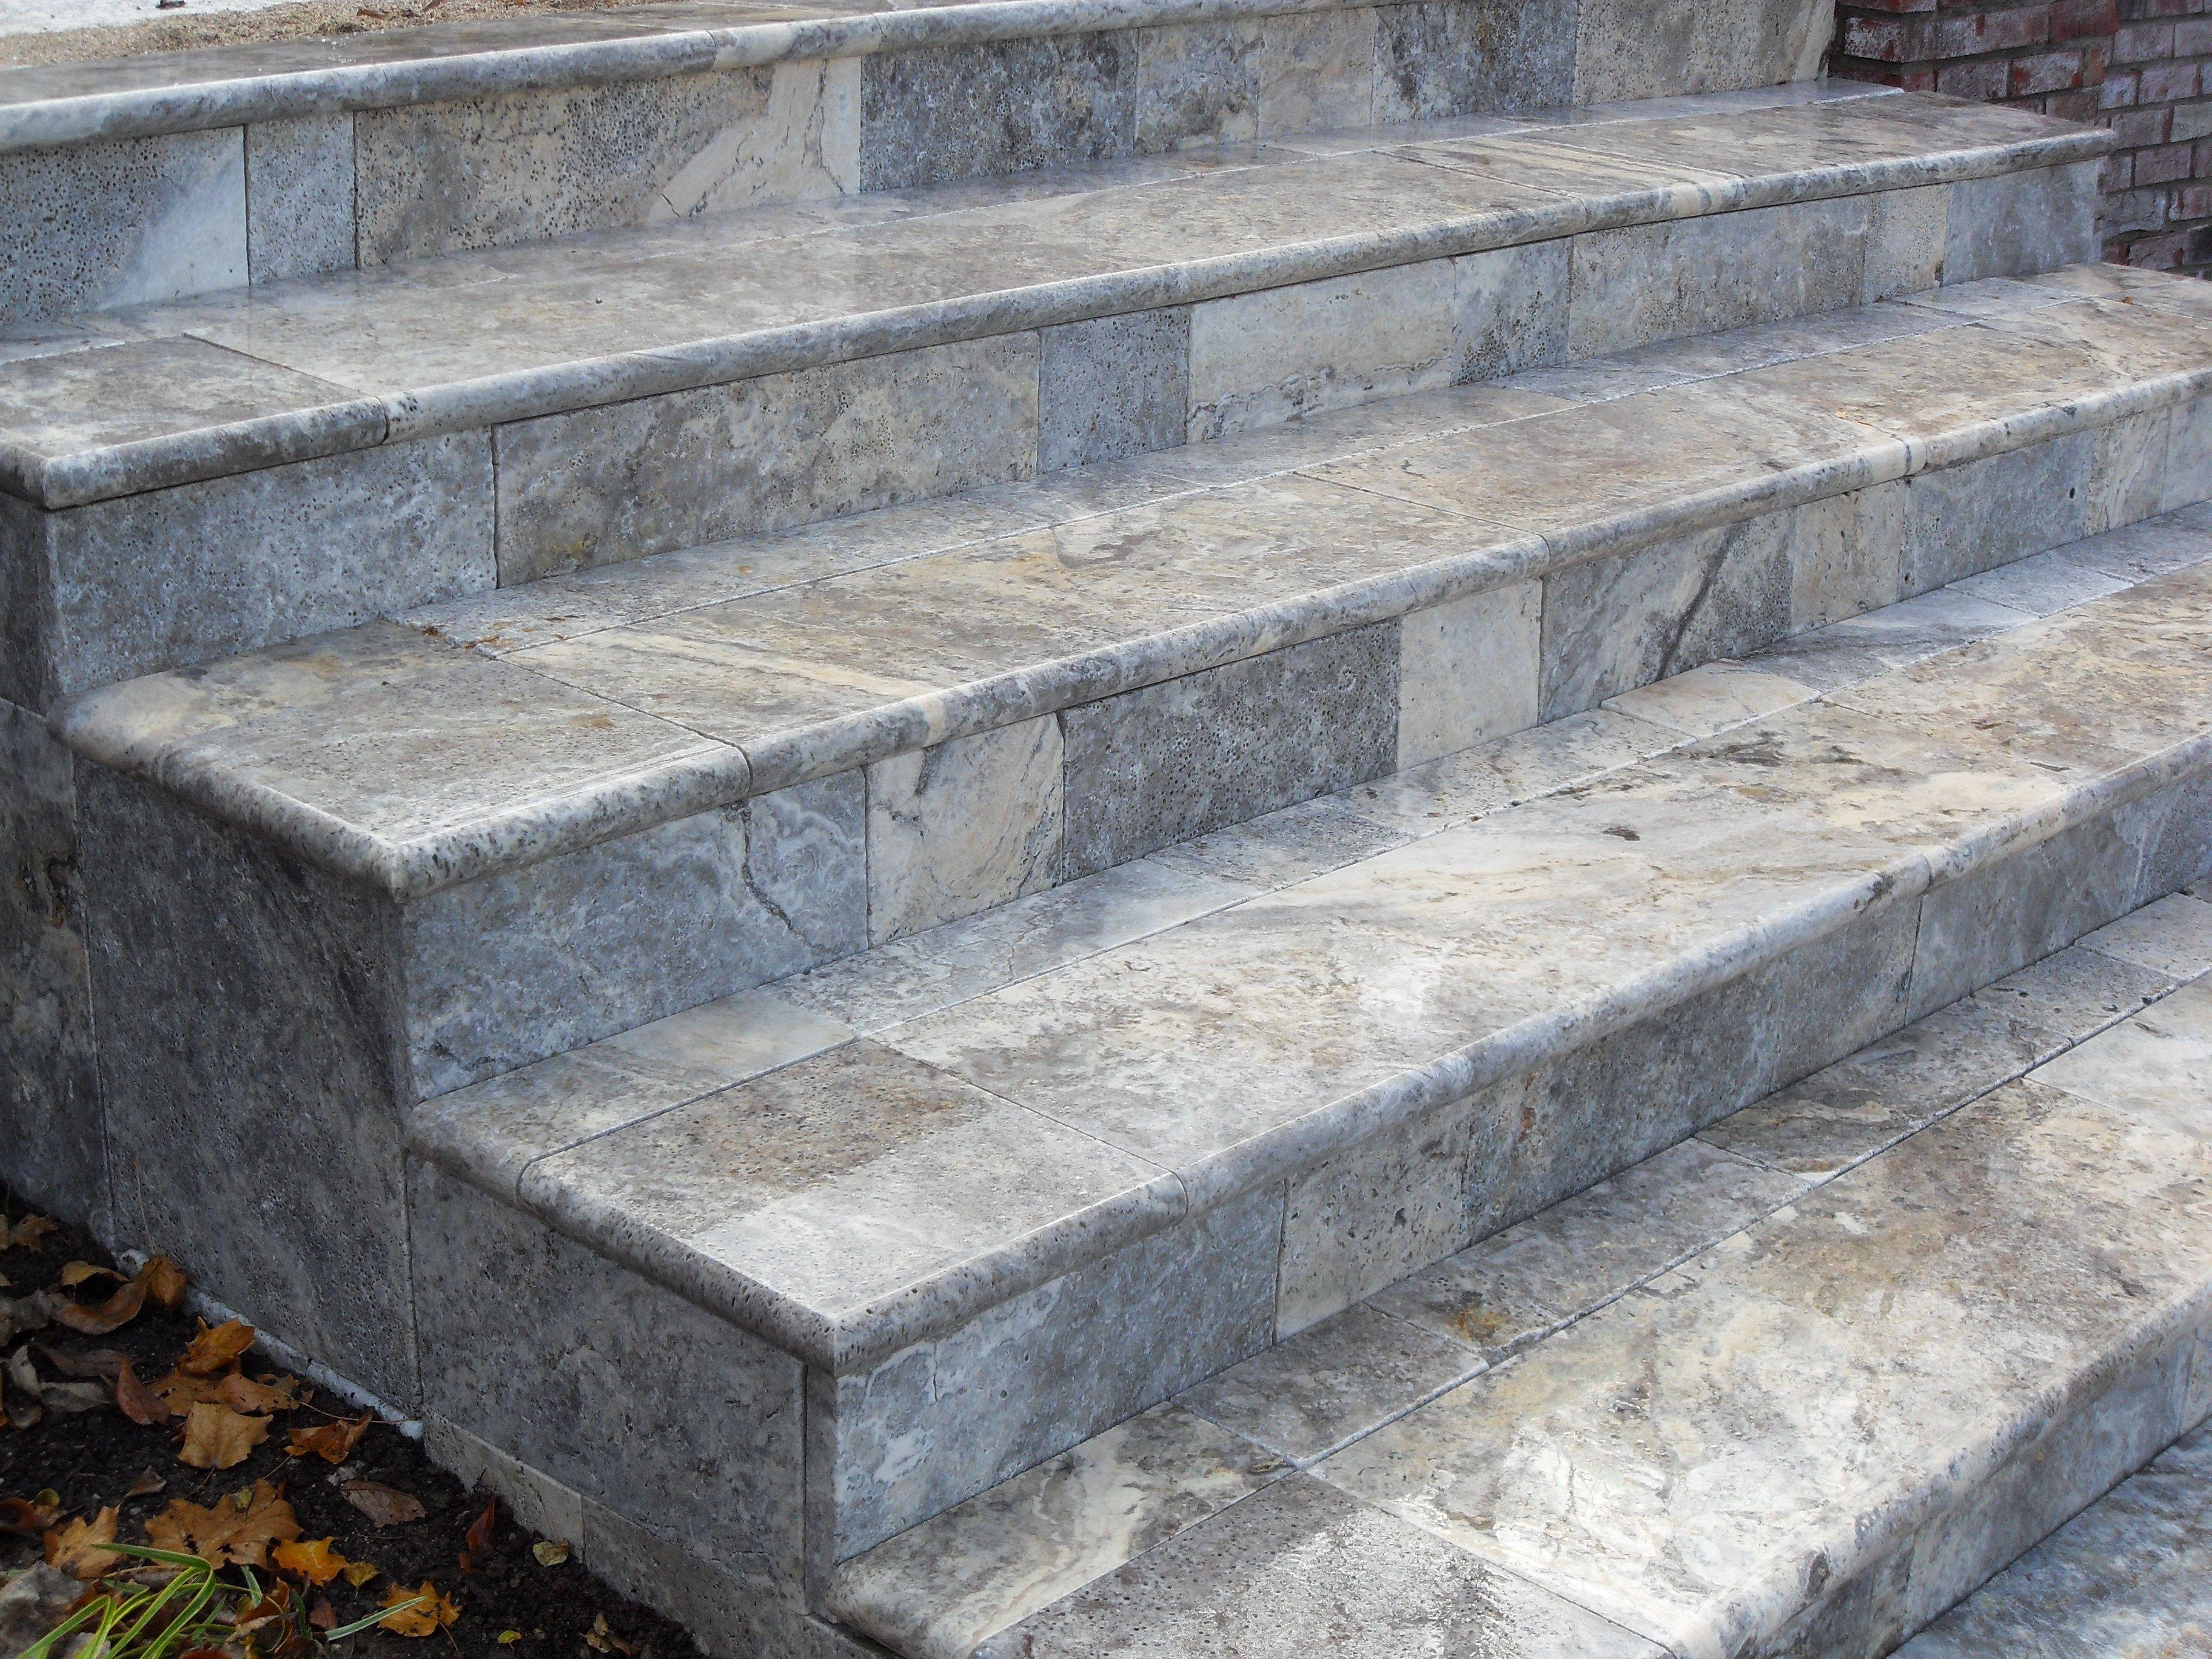 Travertine steps